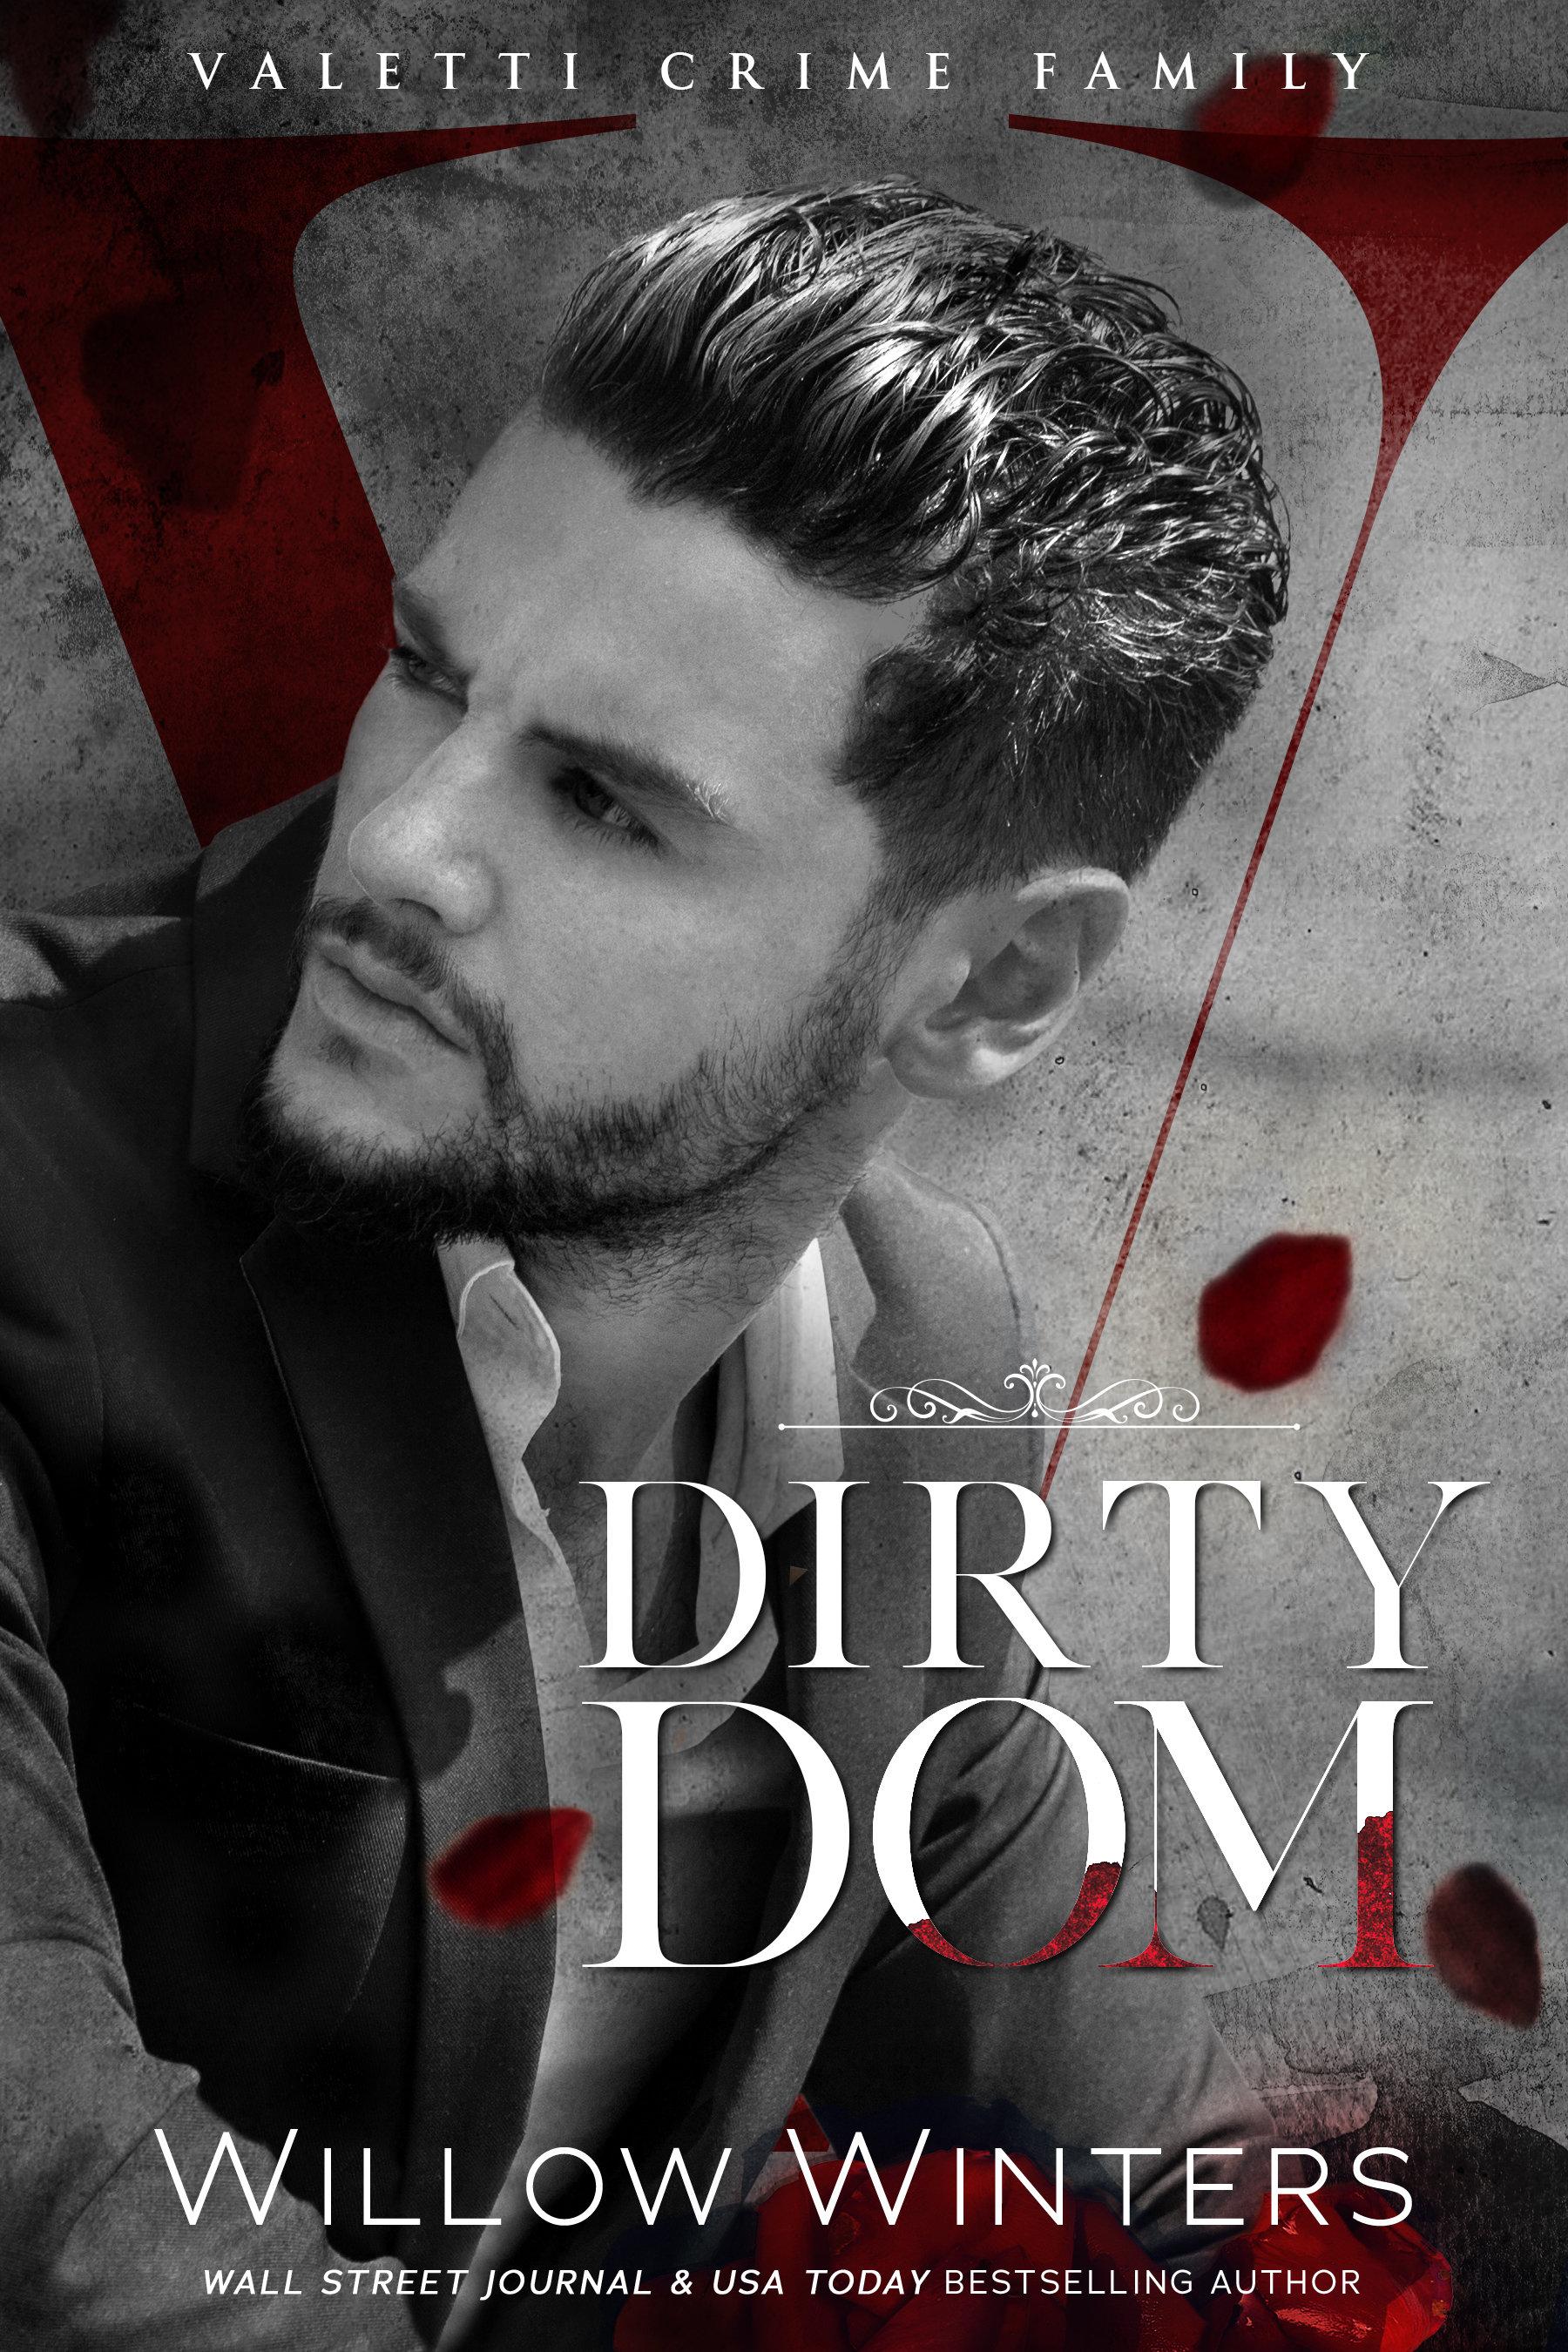 DIRTY_DOM_VALETTI BN.jpg